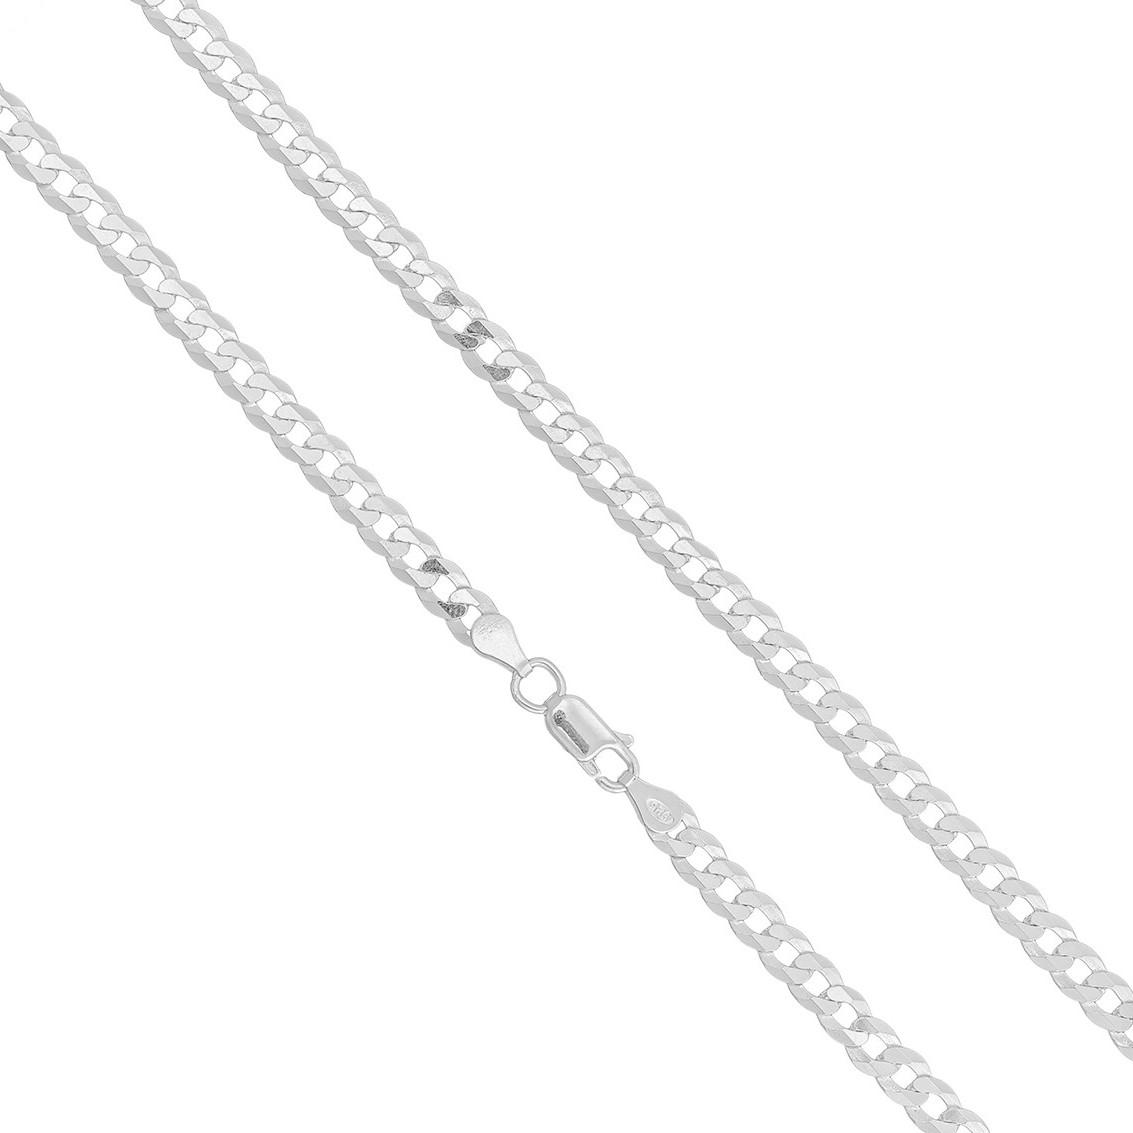 Corrente Prata 925 Grumet Maciça 4.5mm X 70cm